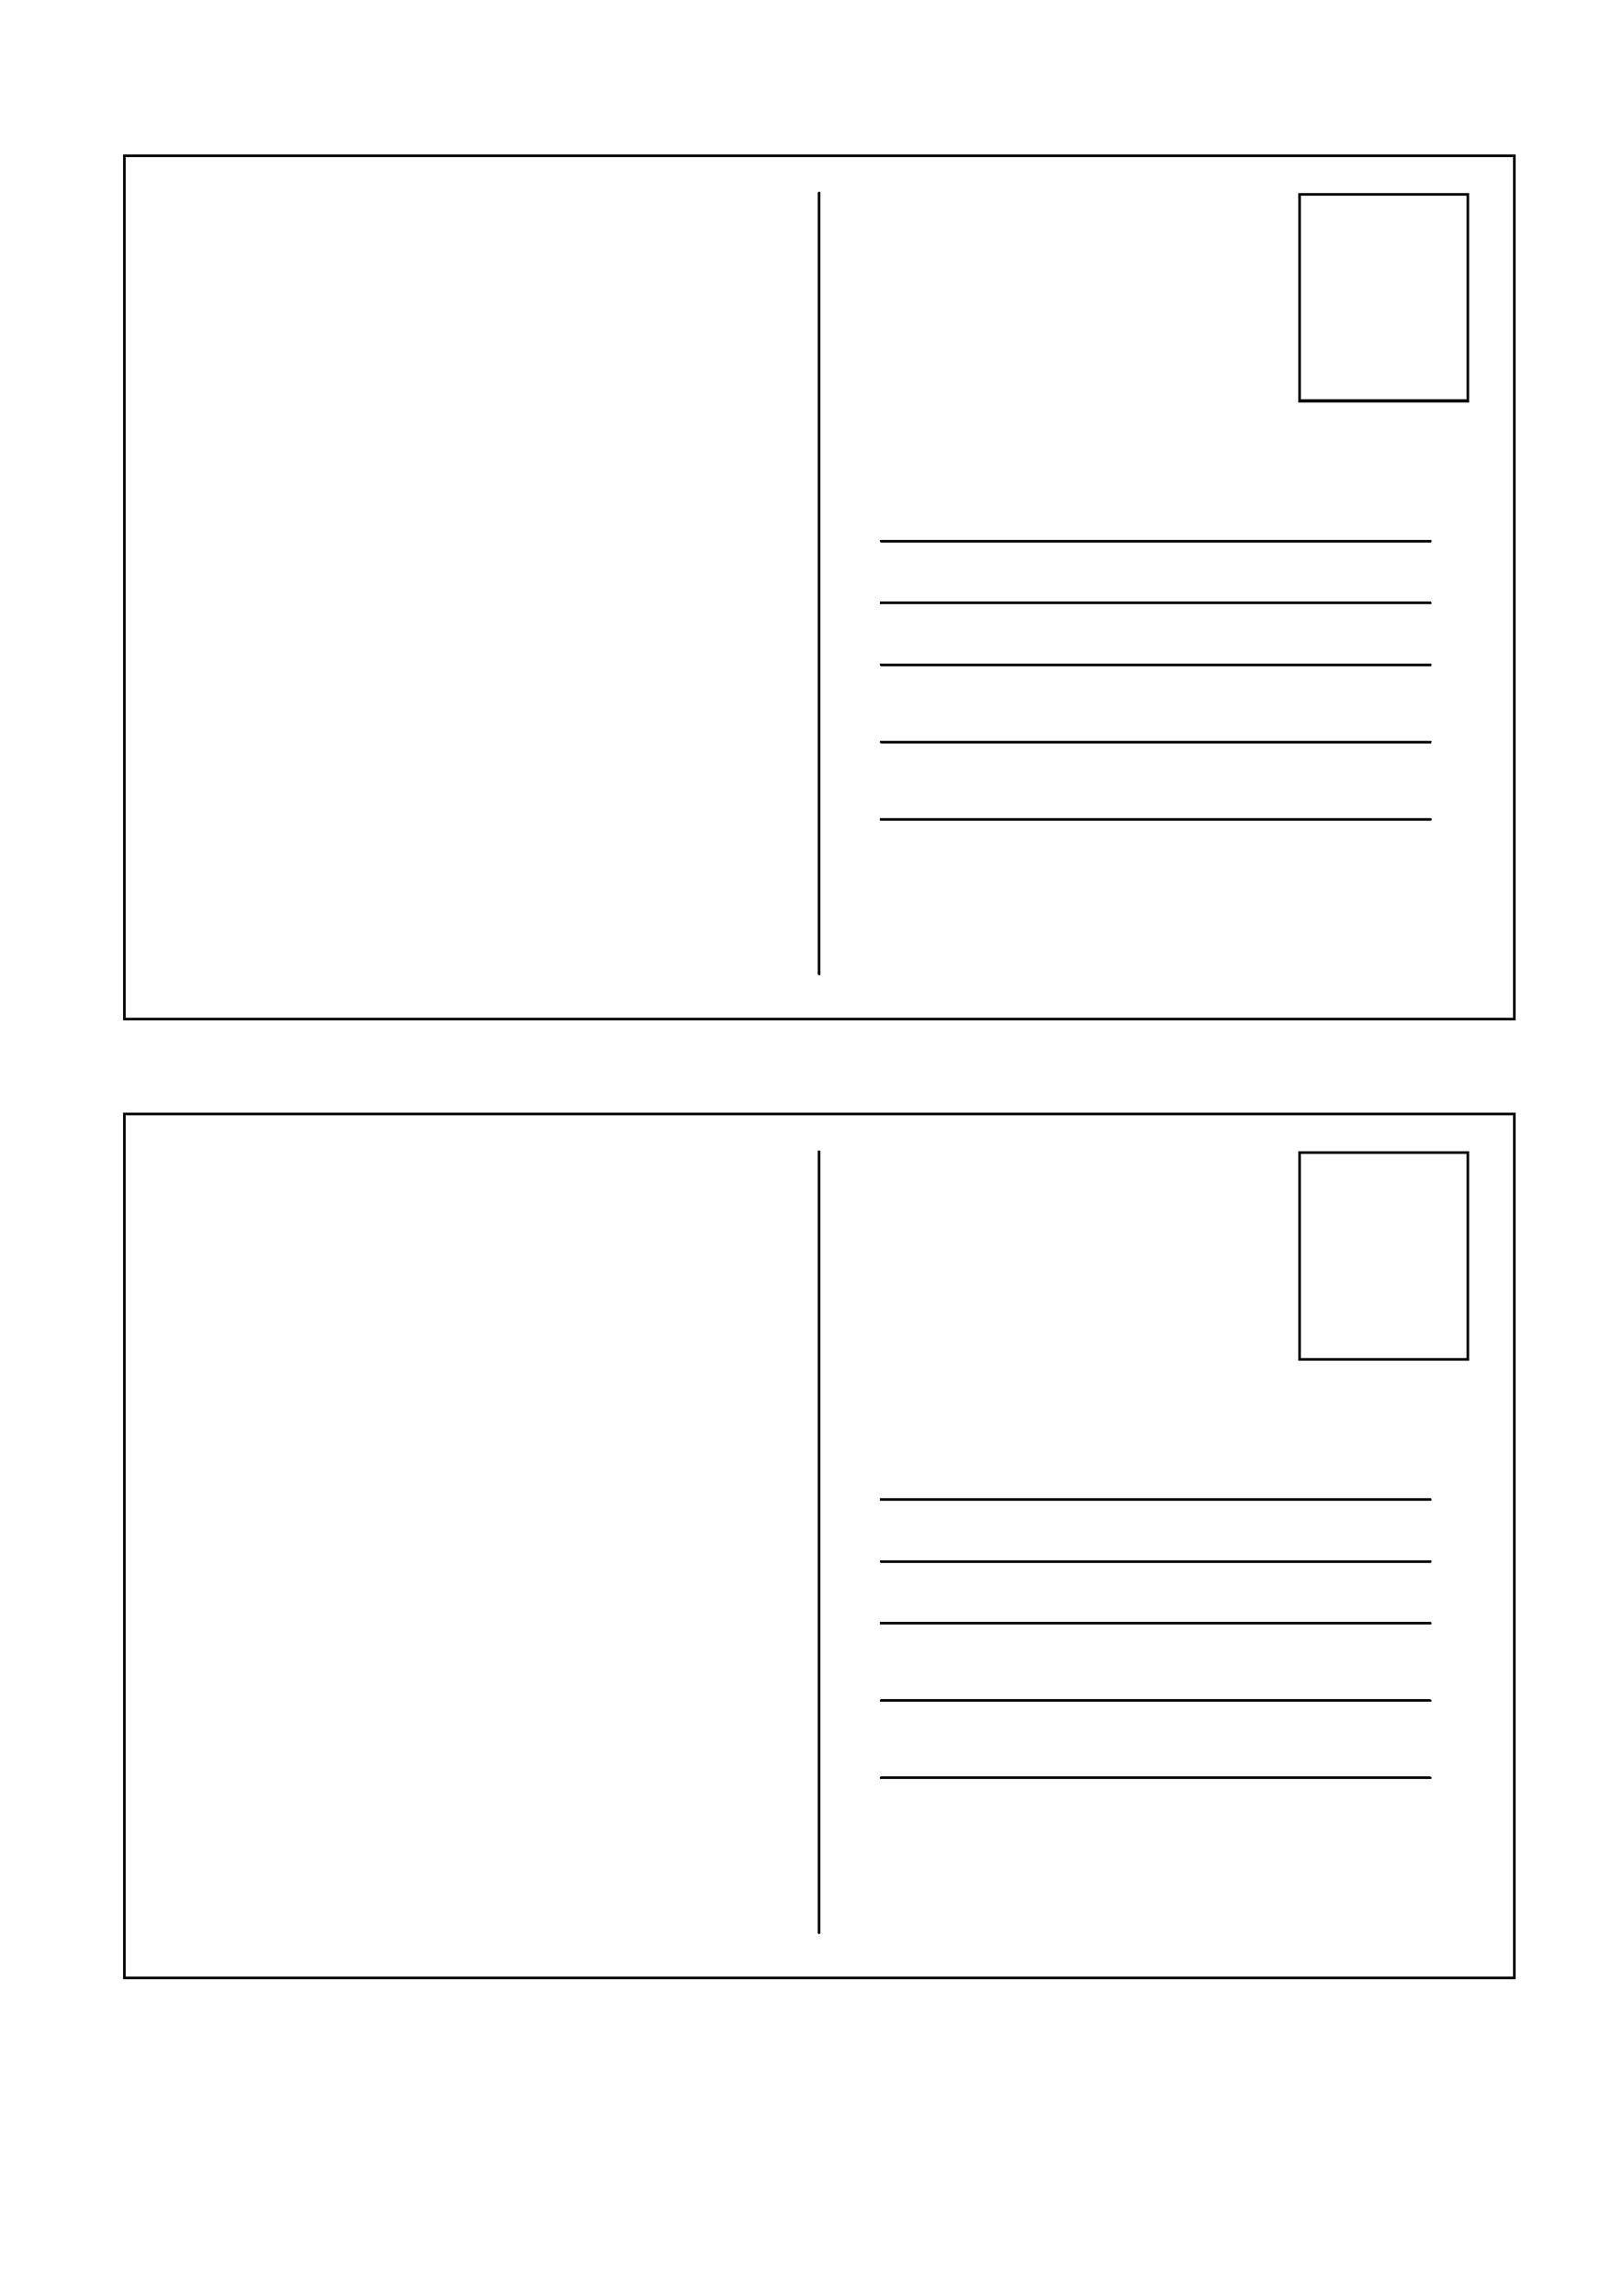 009 Impressive Free Postcard Template Download Microsoft Word Concept Full